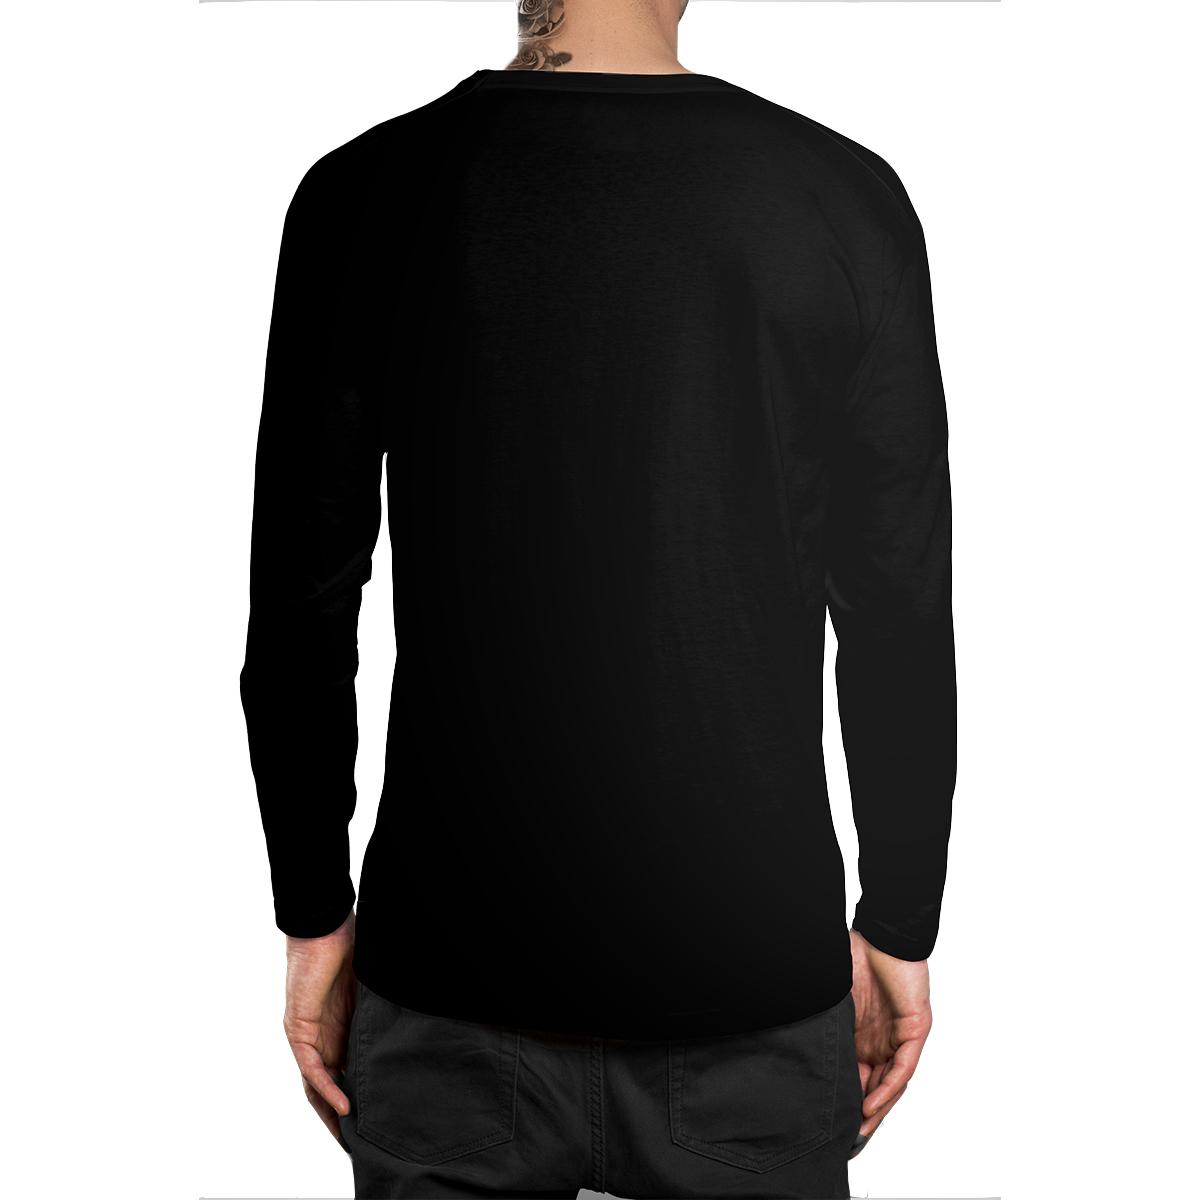 Stompy Camiseta Manga Longa Modelo 23